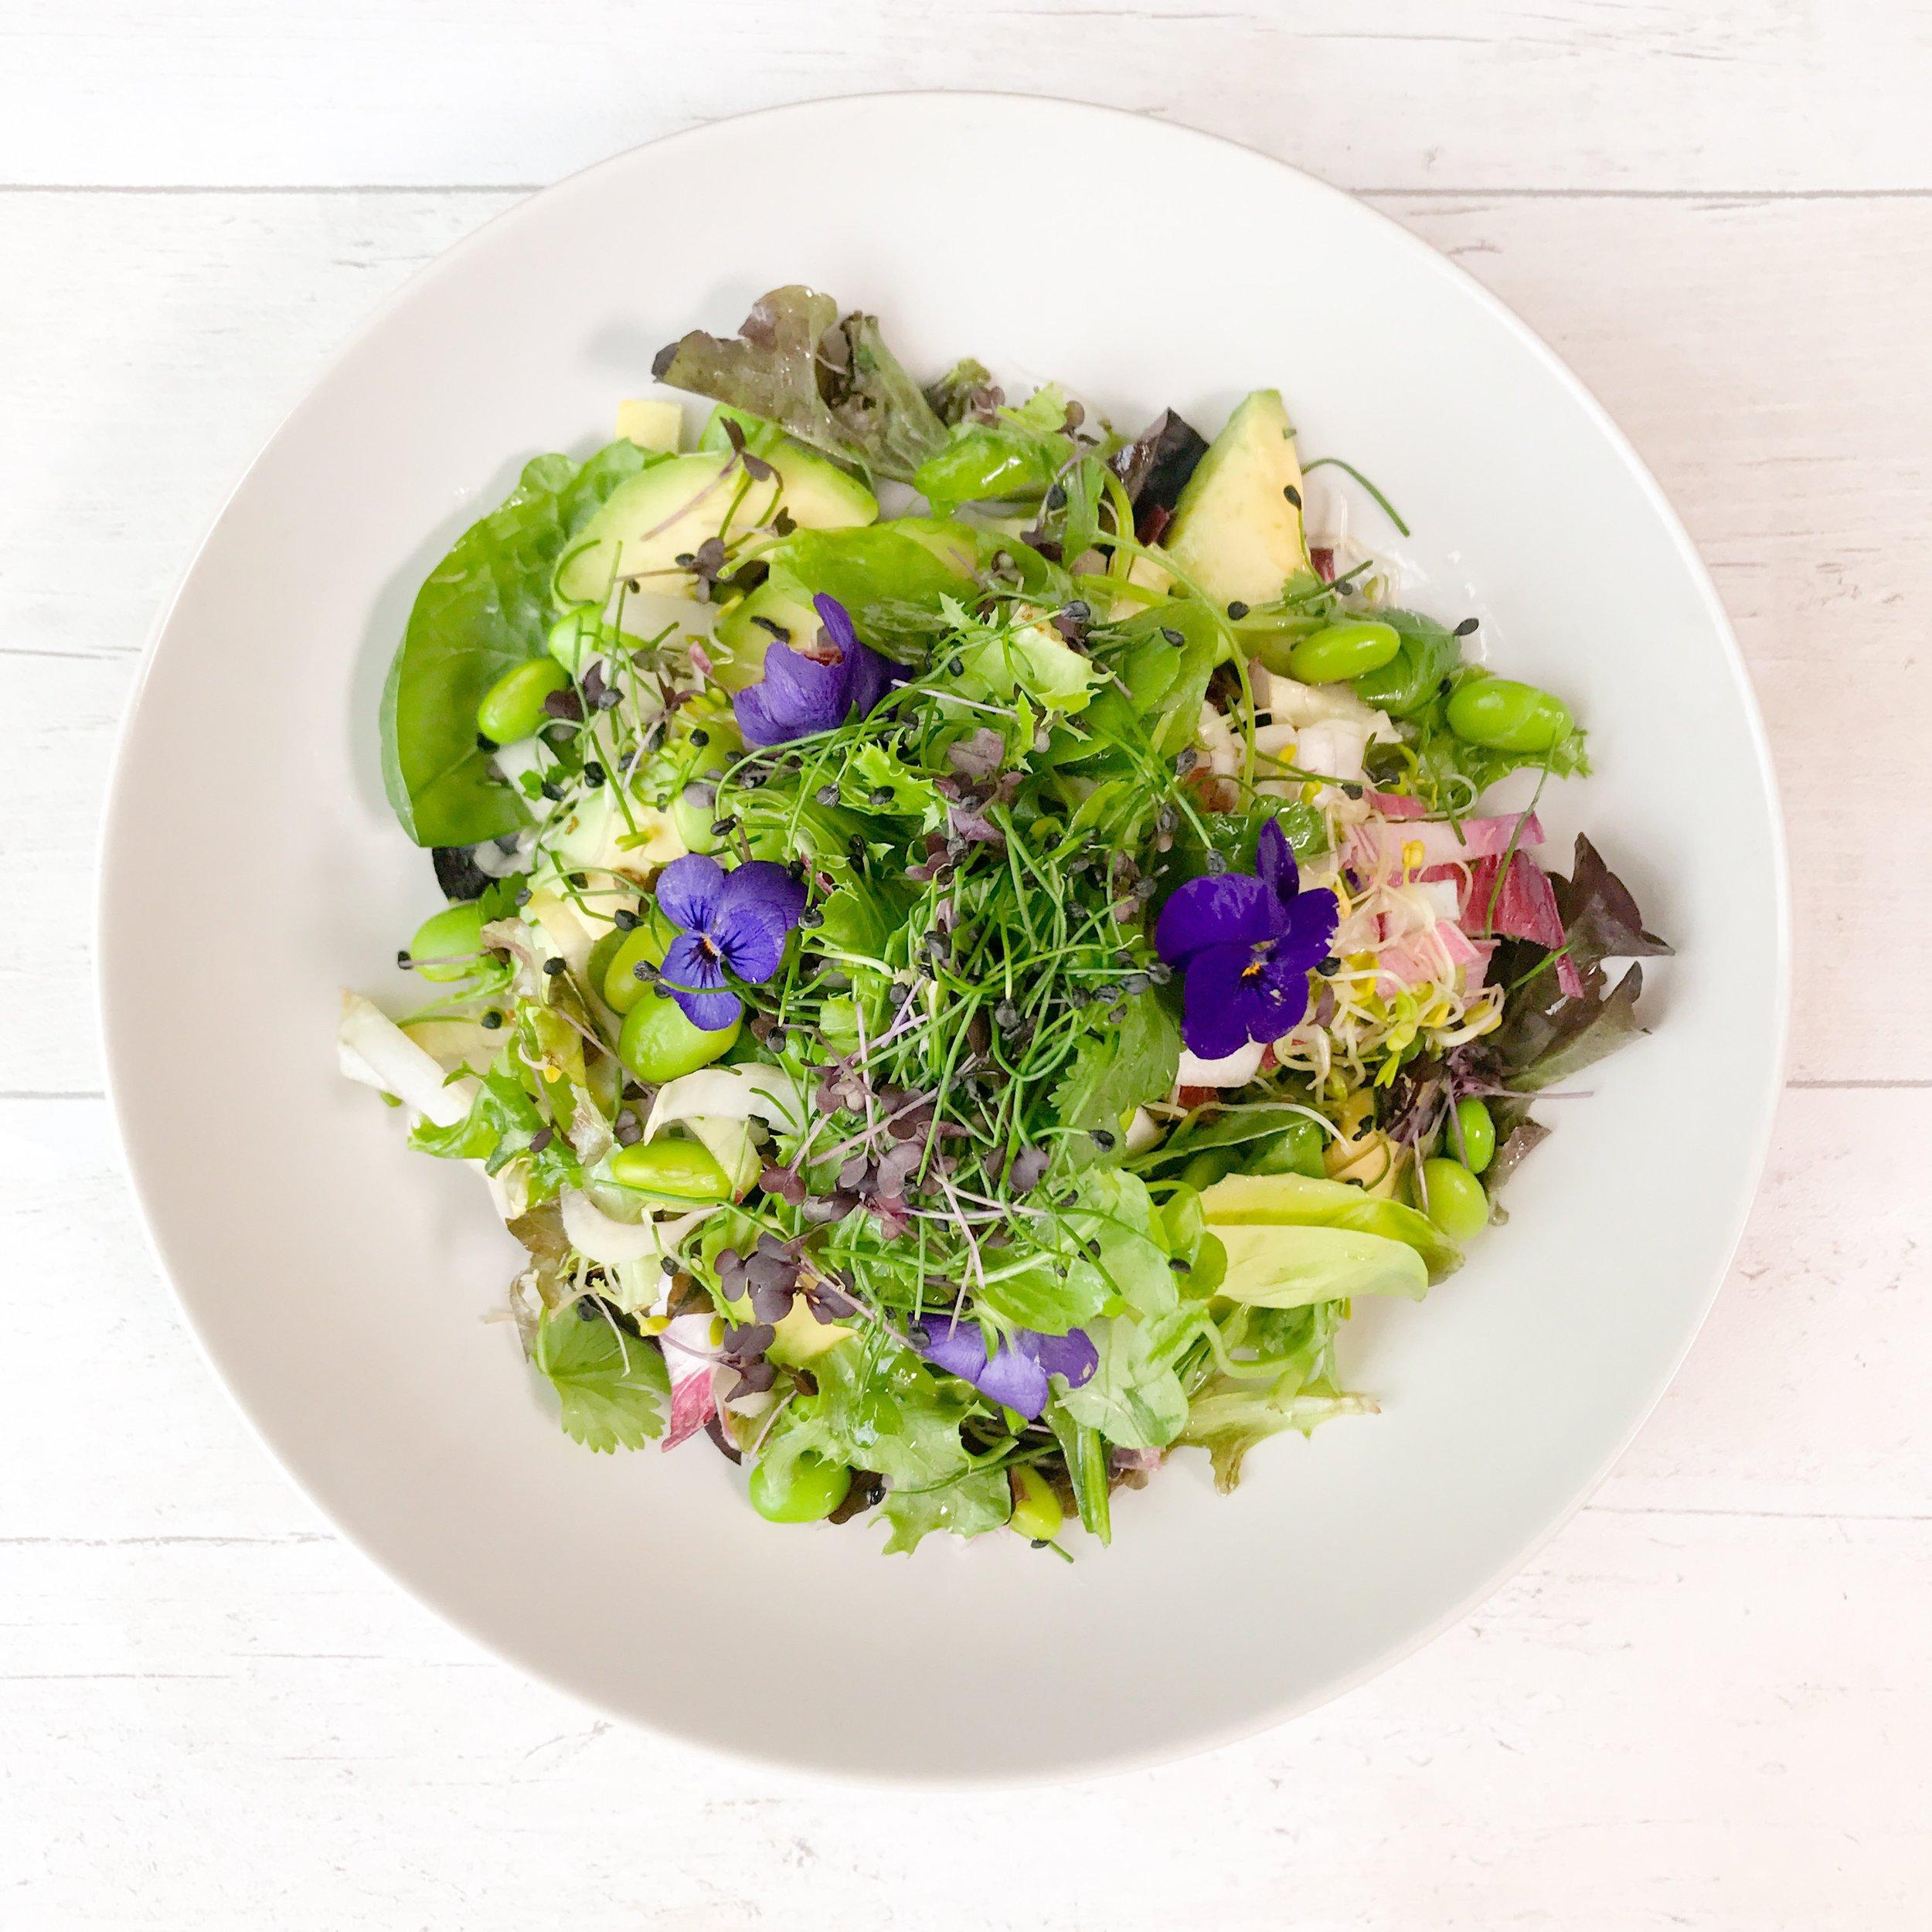 Green_salad_bowlJPEG.JPEG